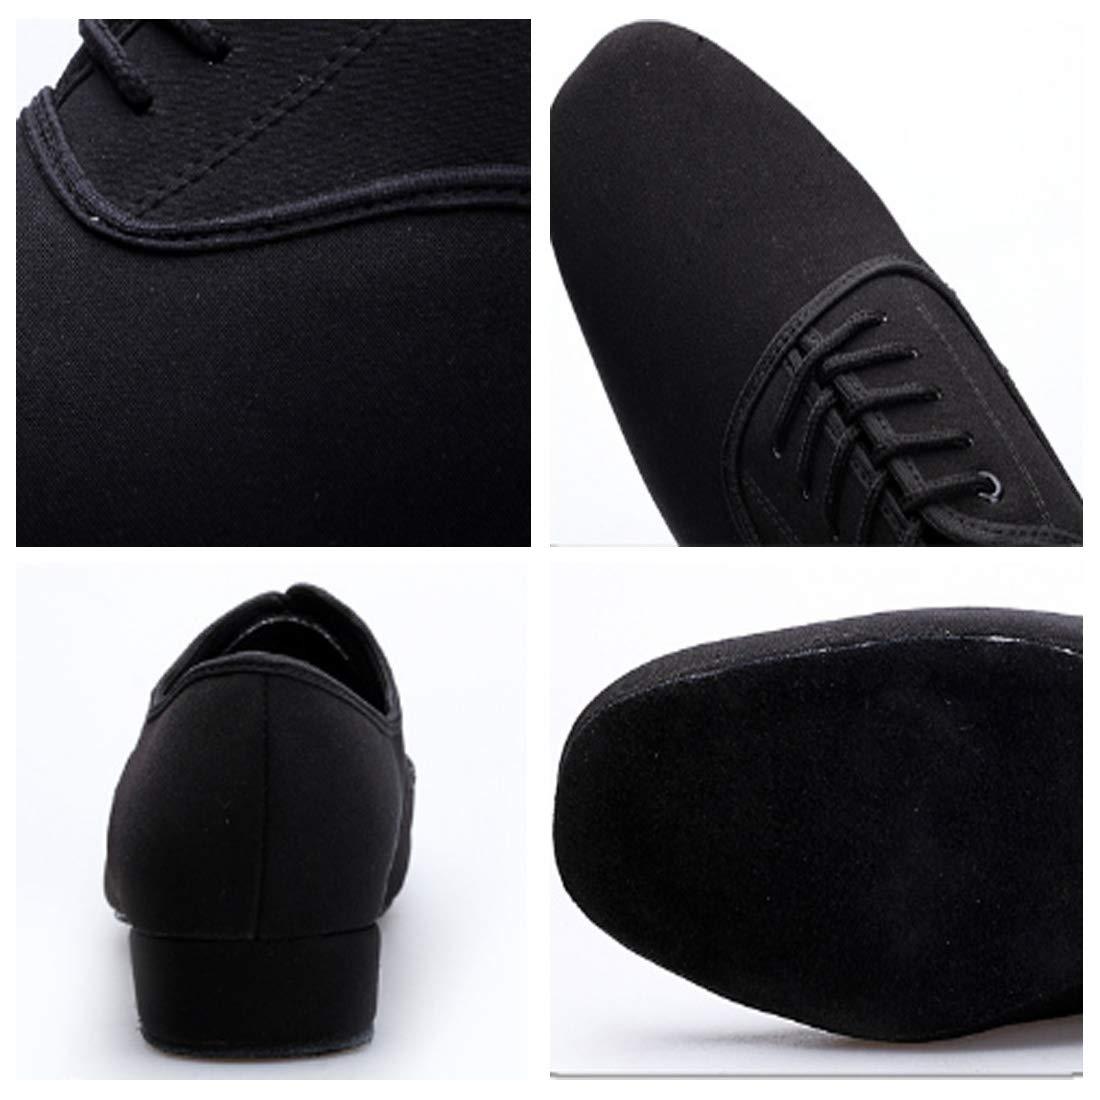 DAIYO Mens Ballroom Dance Modern Dance Shoes Adult Lacing Low Heeled Casual Shoes